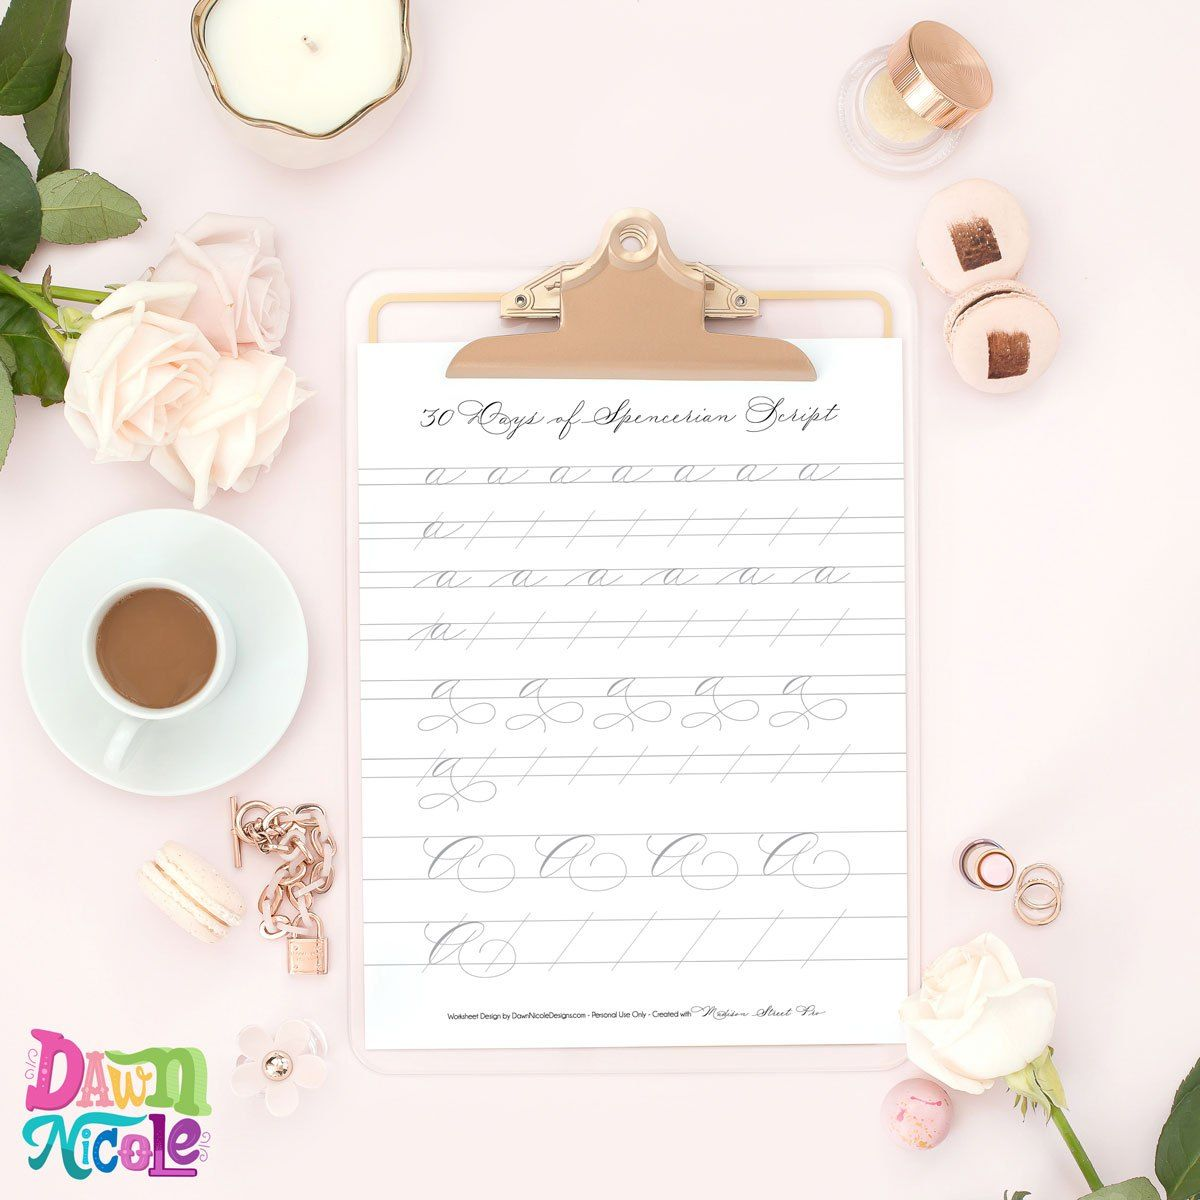 Spencerian Script Style Letter A Worksheets